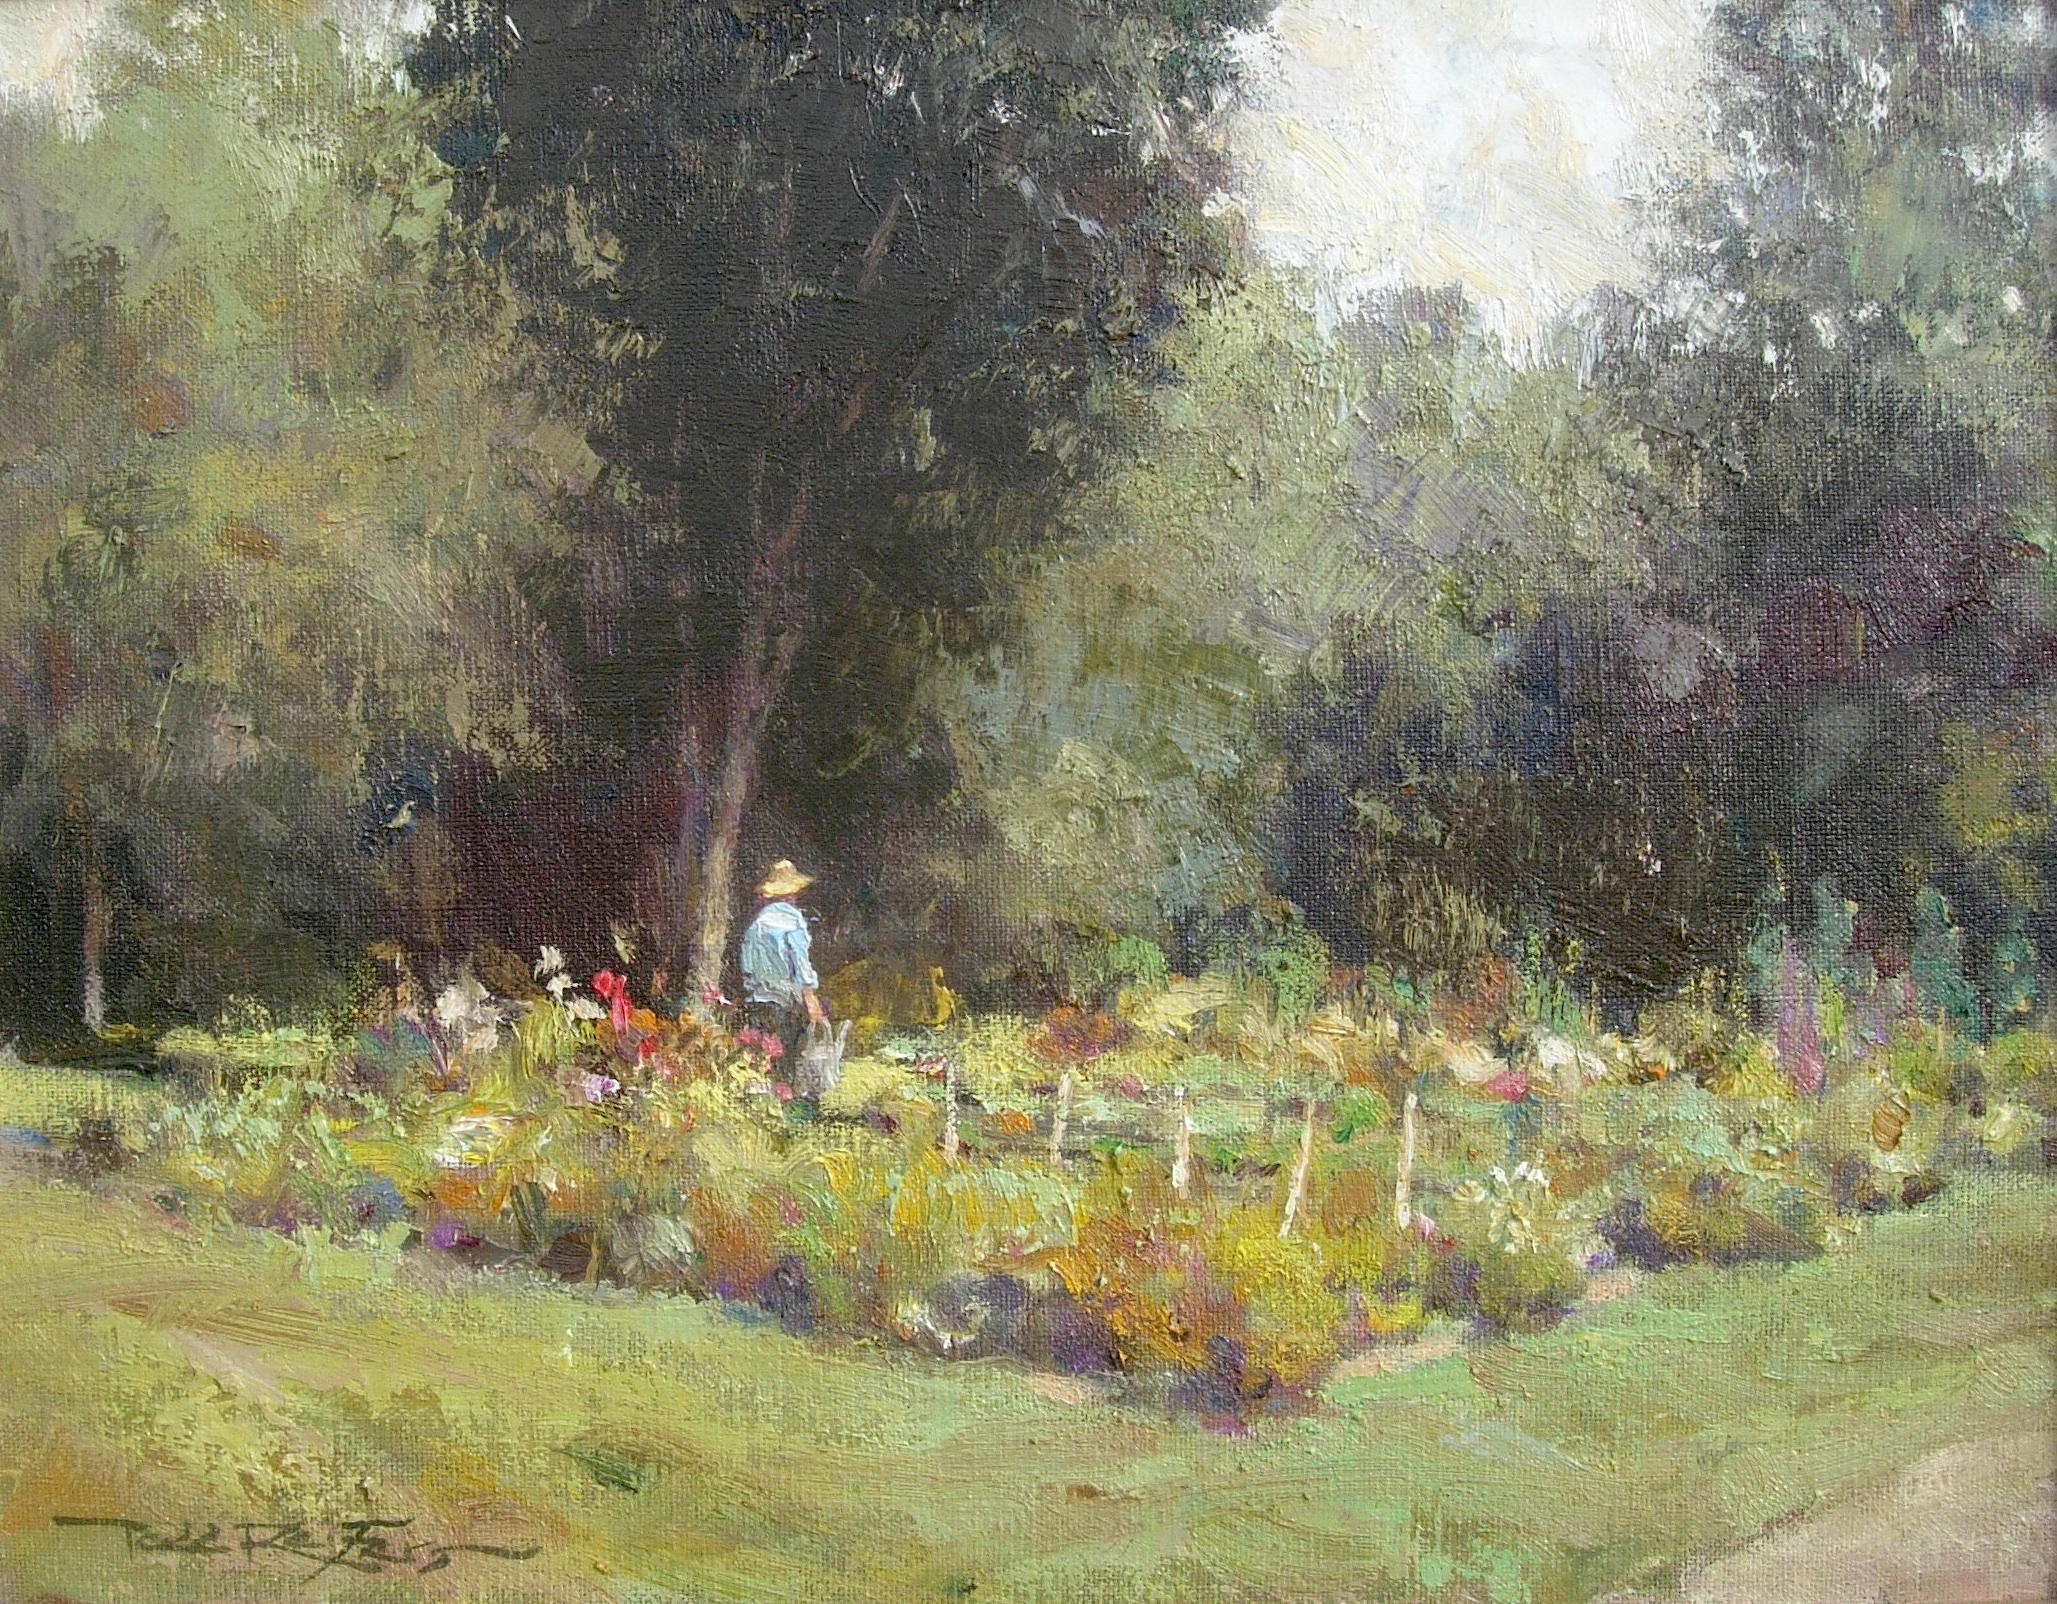 reifers-countrygardennew-cropped